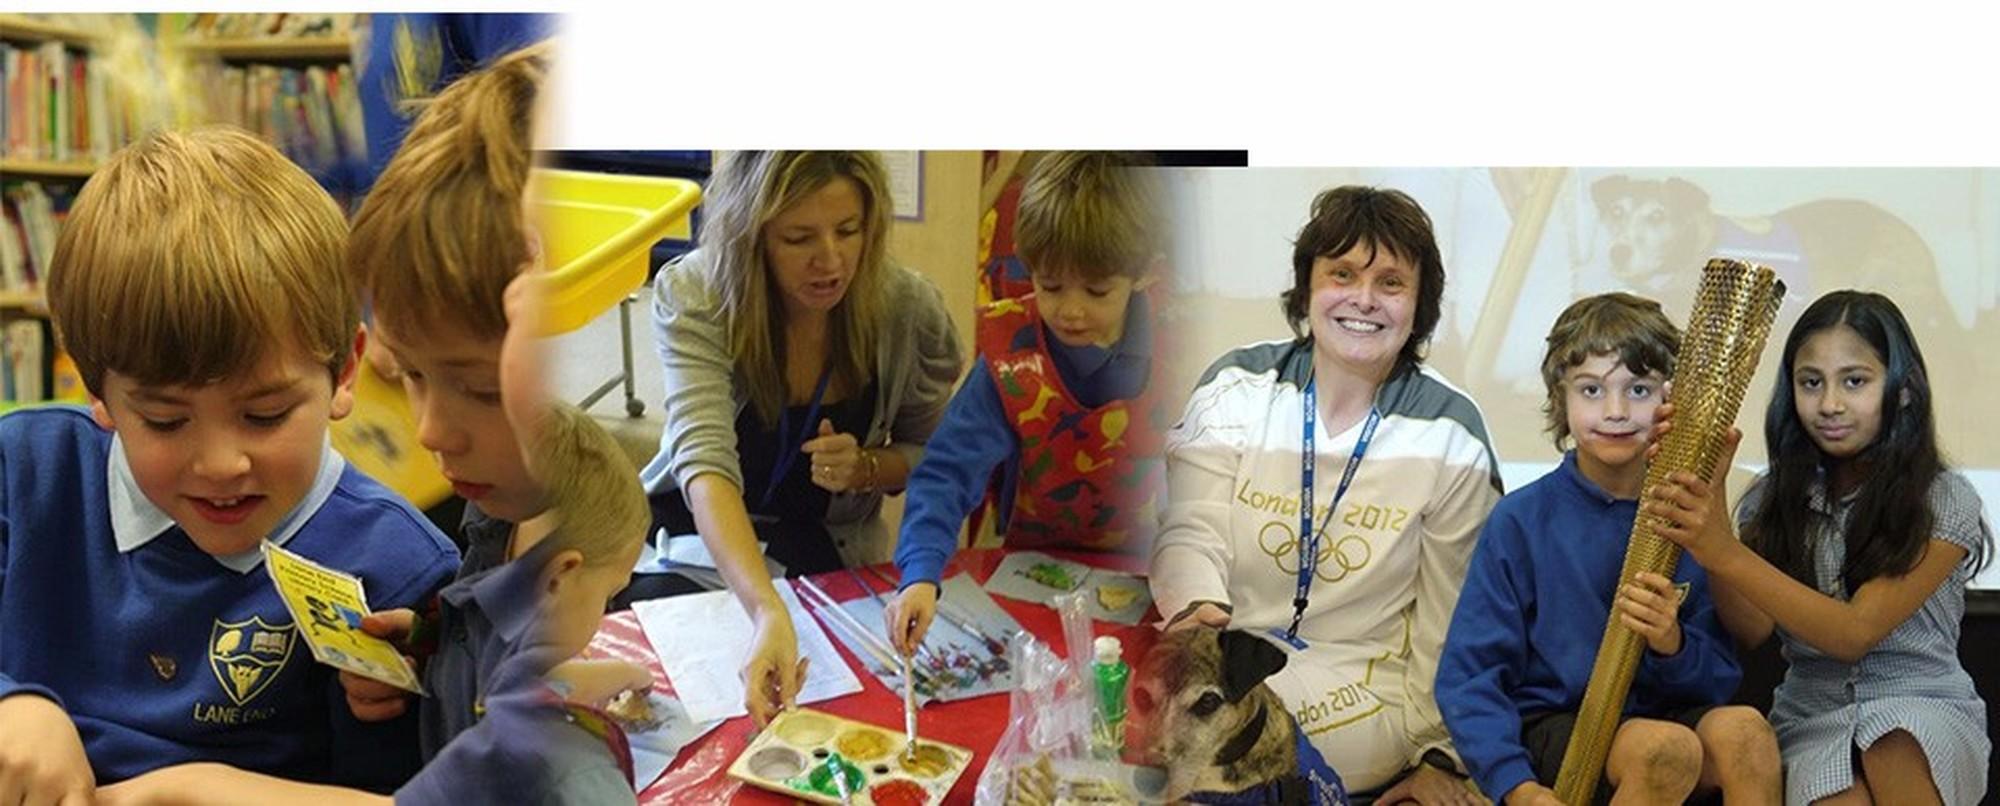 Virtual Tour Of A Family Friendly Patnership School